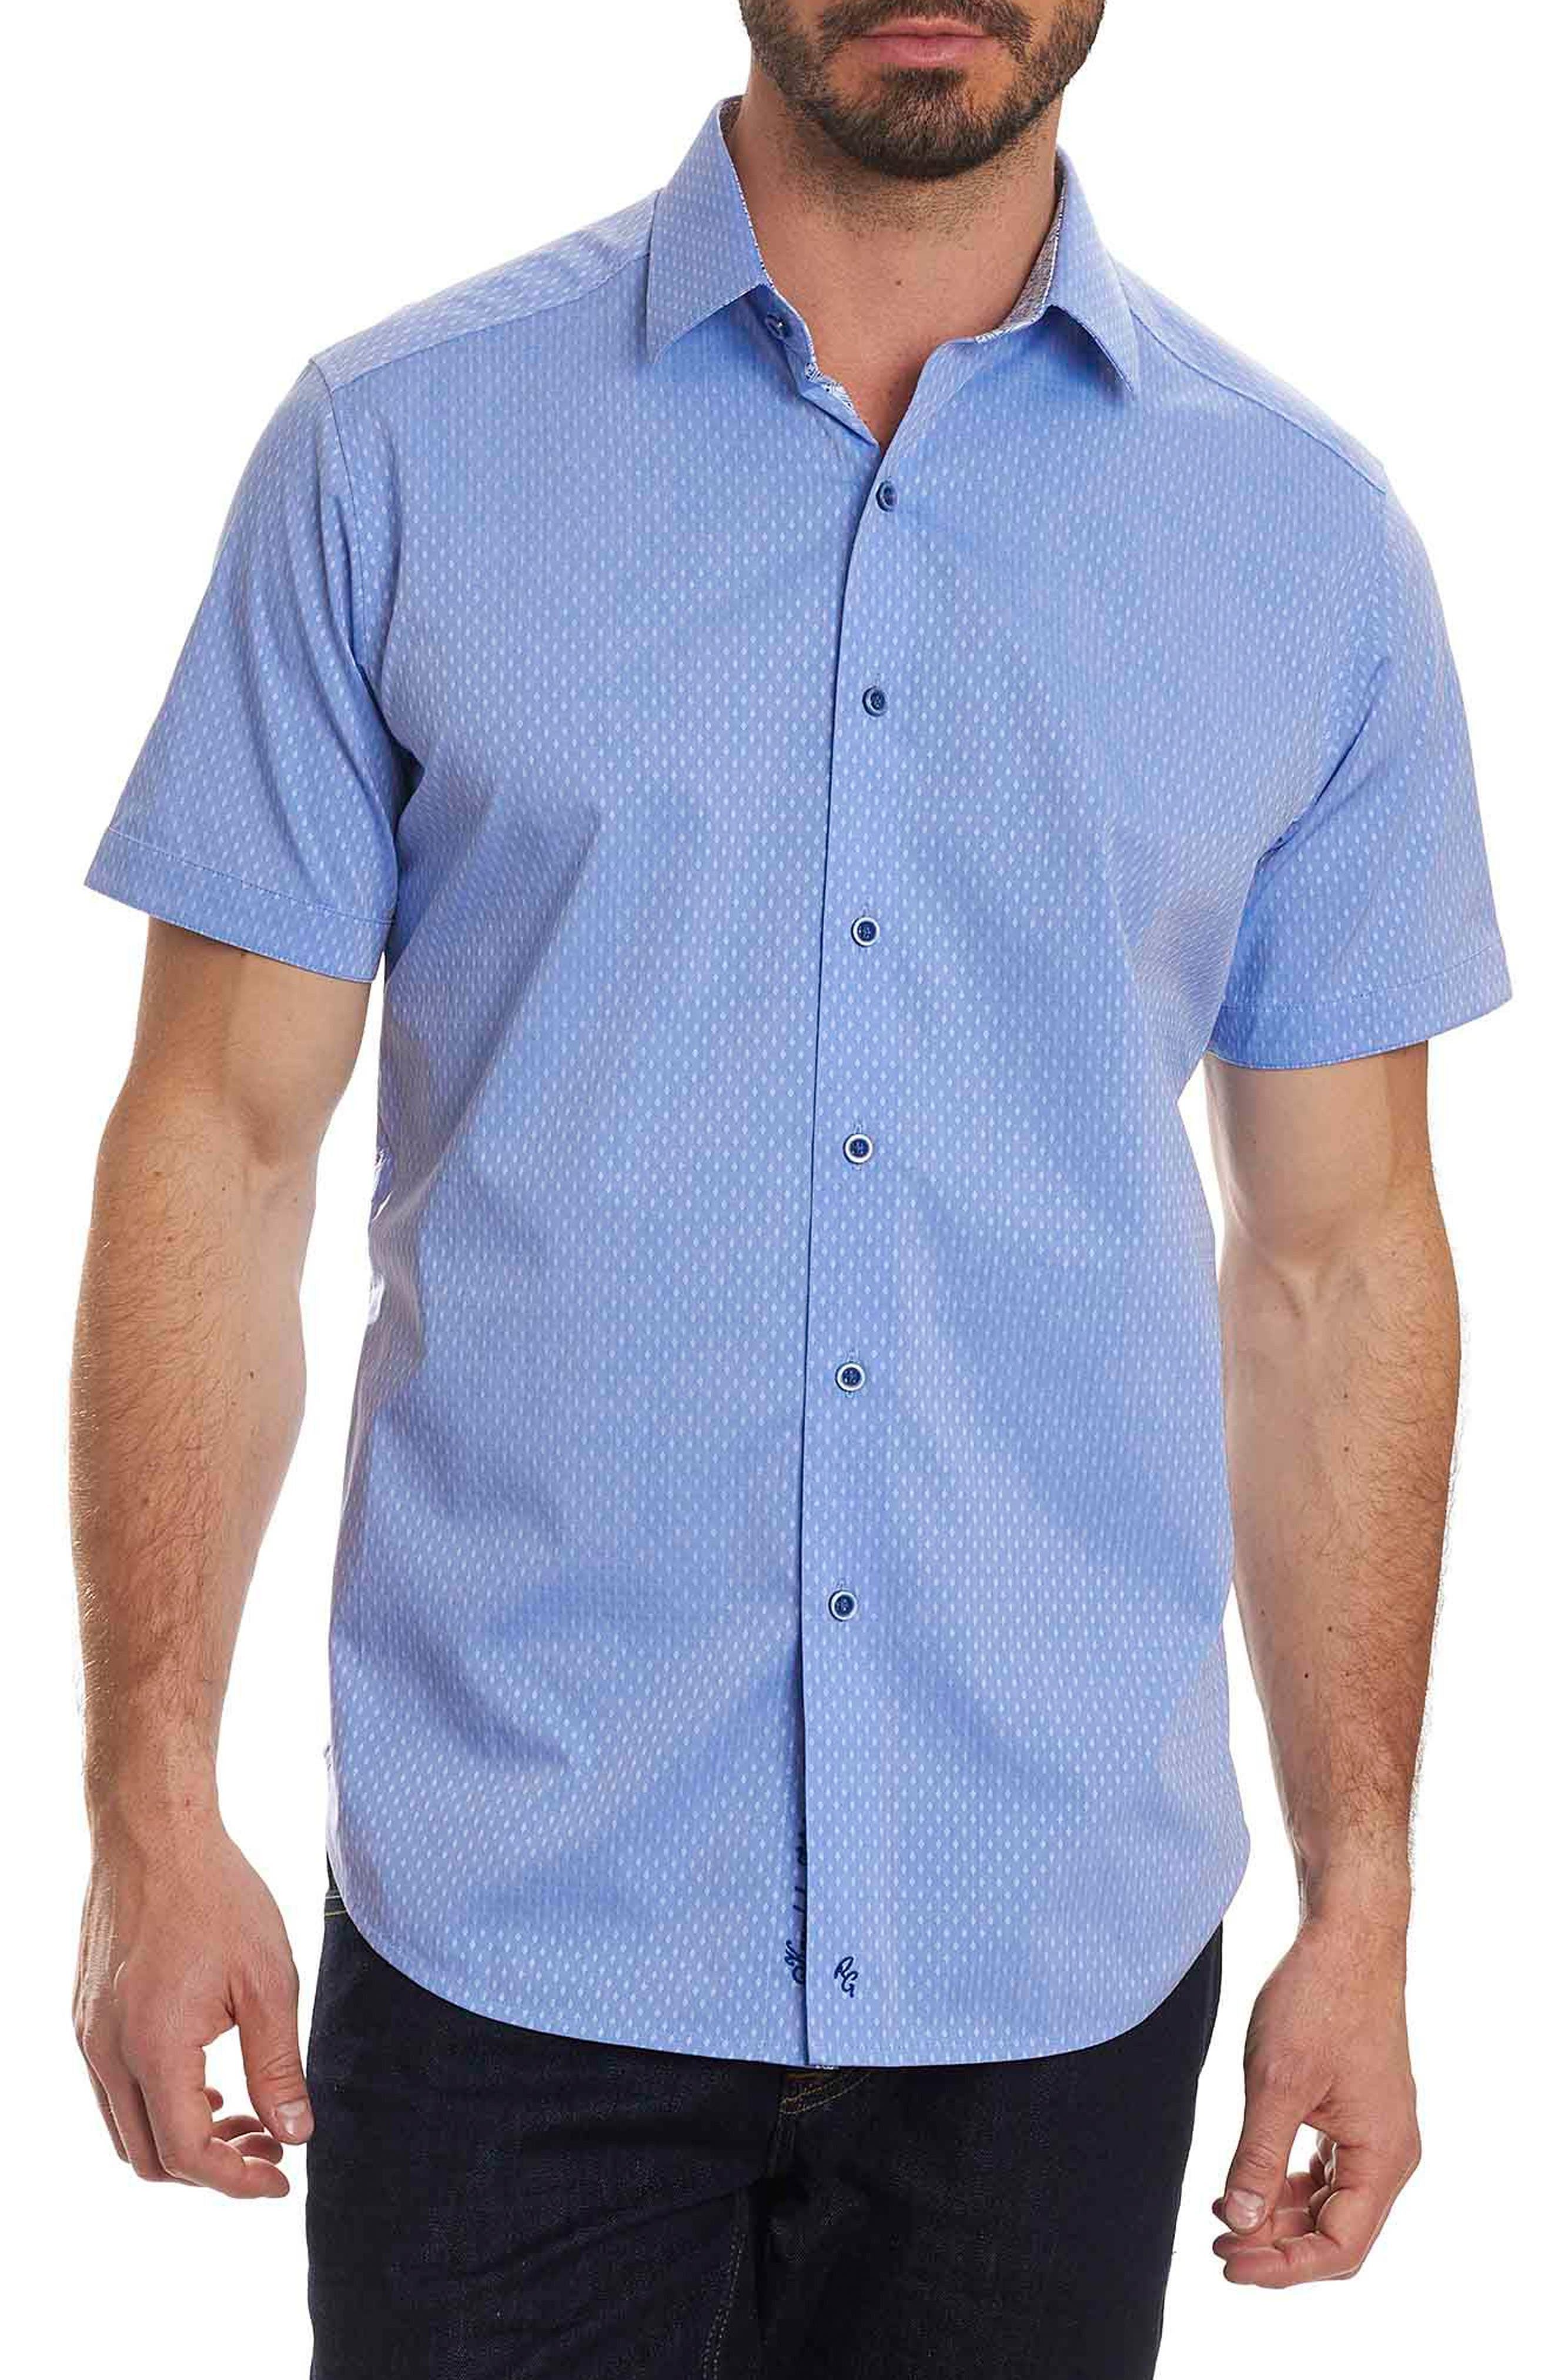 Alternate Image 1 Selected - Robert Graham Clemens Short Sleeve Sport Shirt